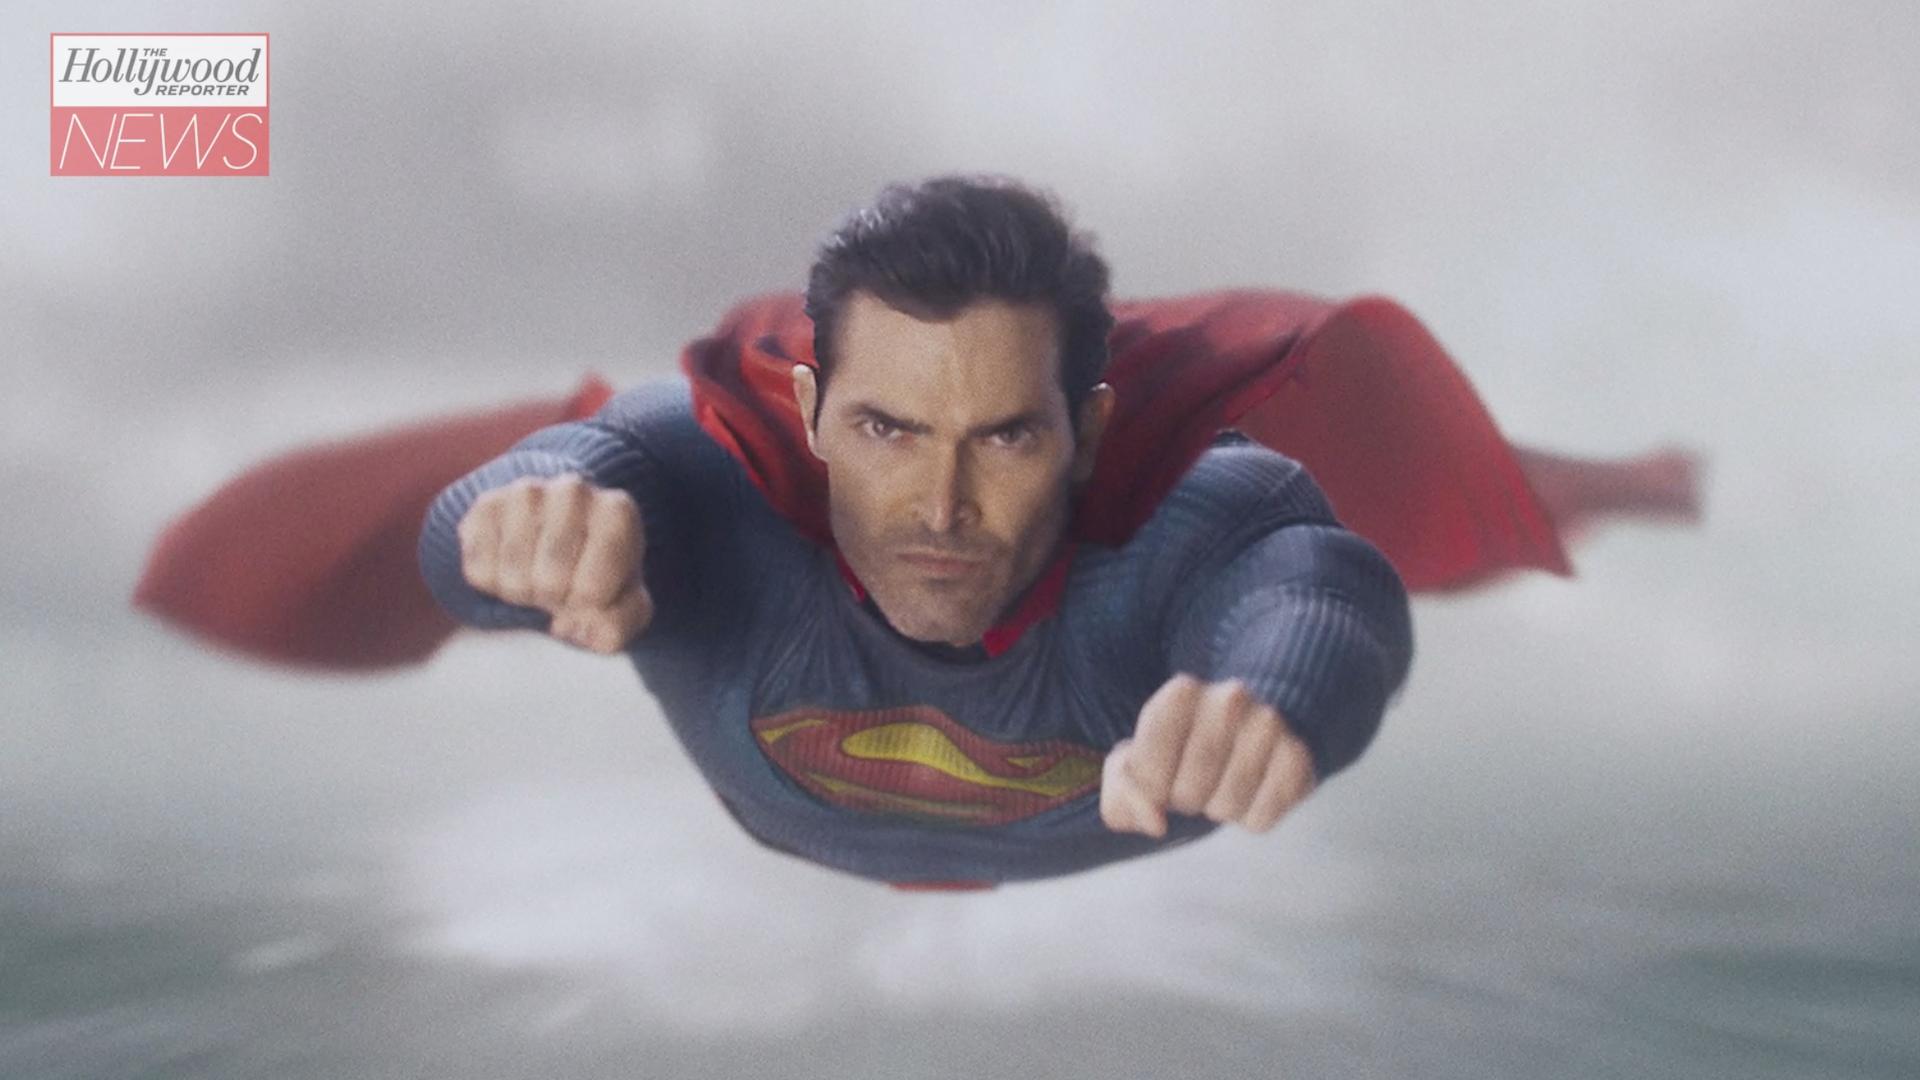 The CW Renews 'Superman & Lois' For a Second Season | THR News